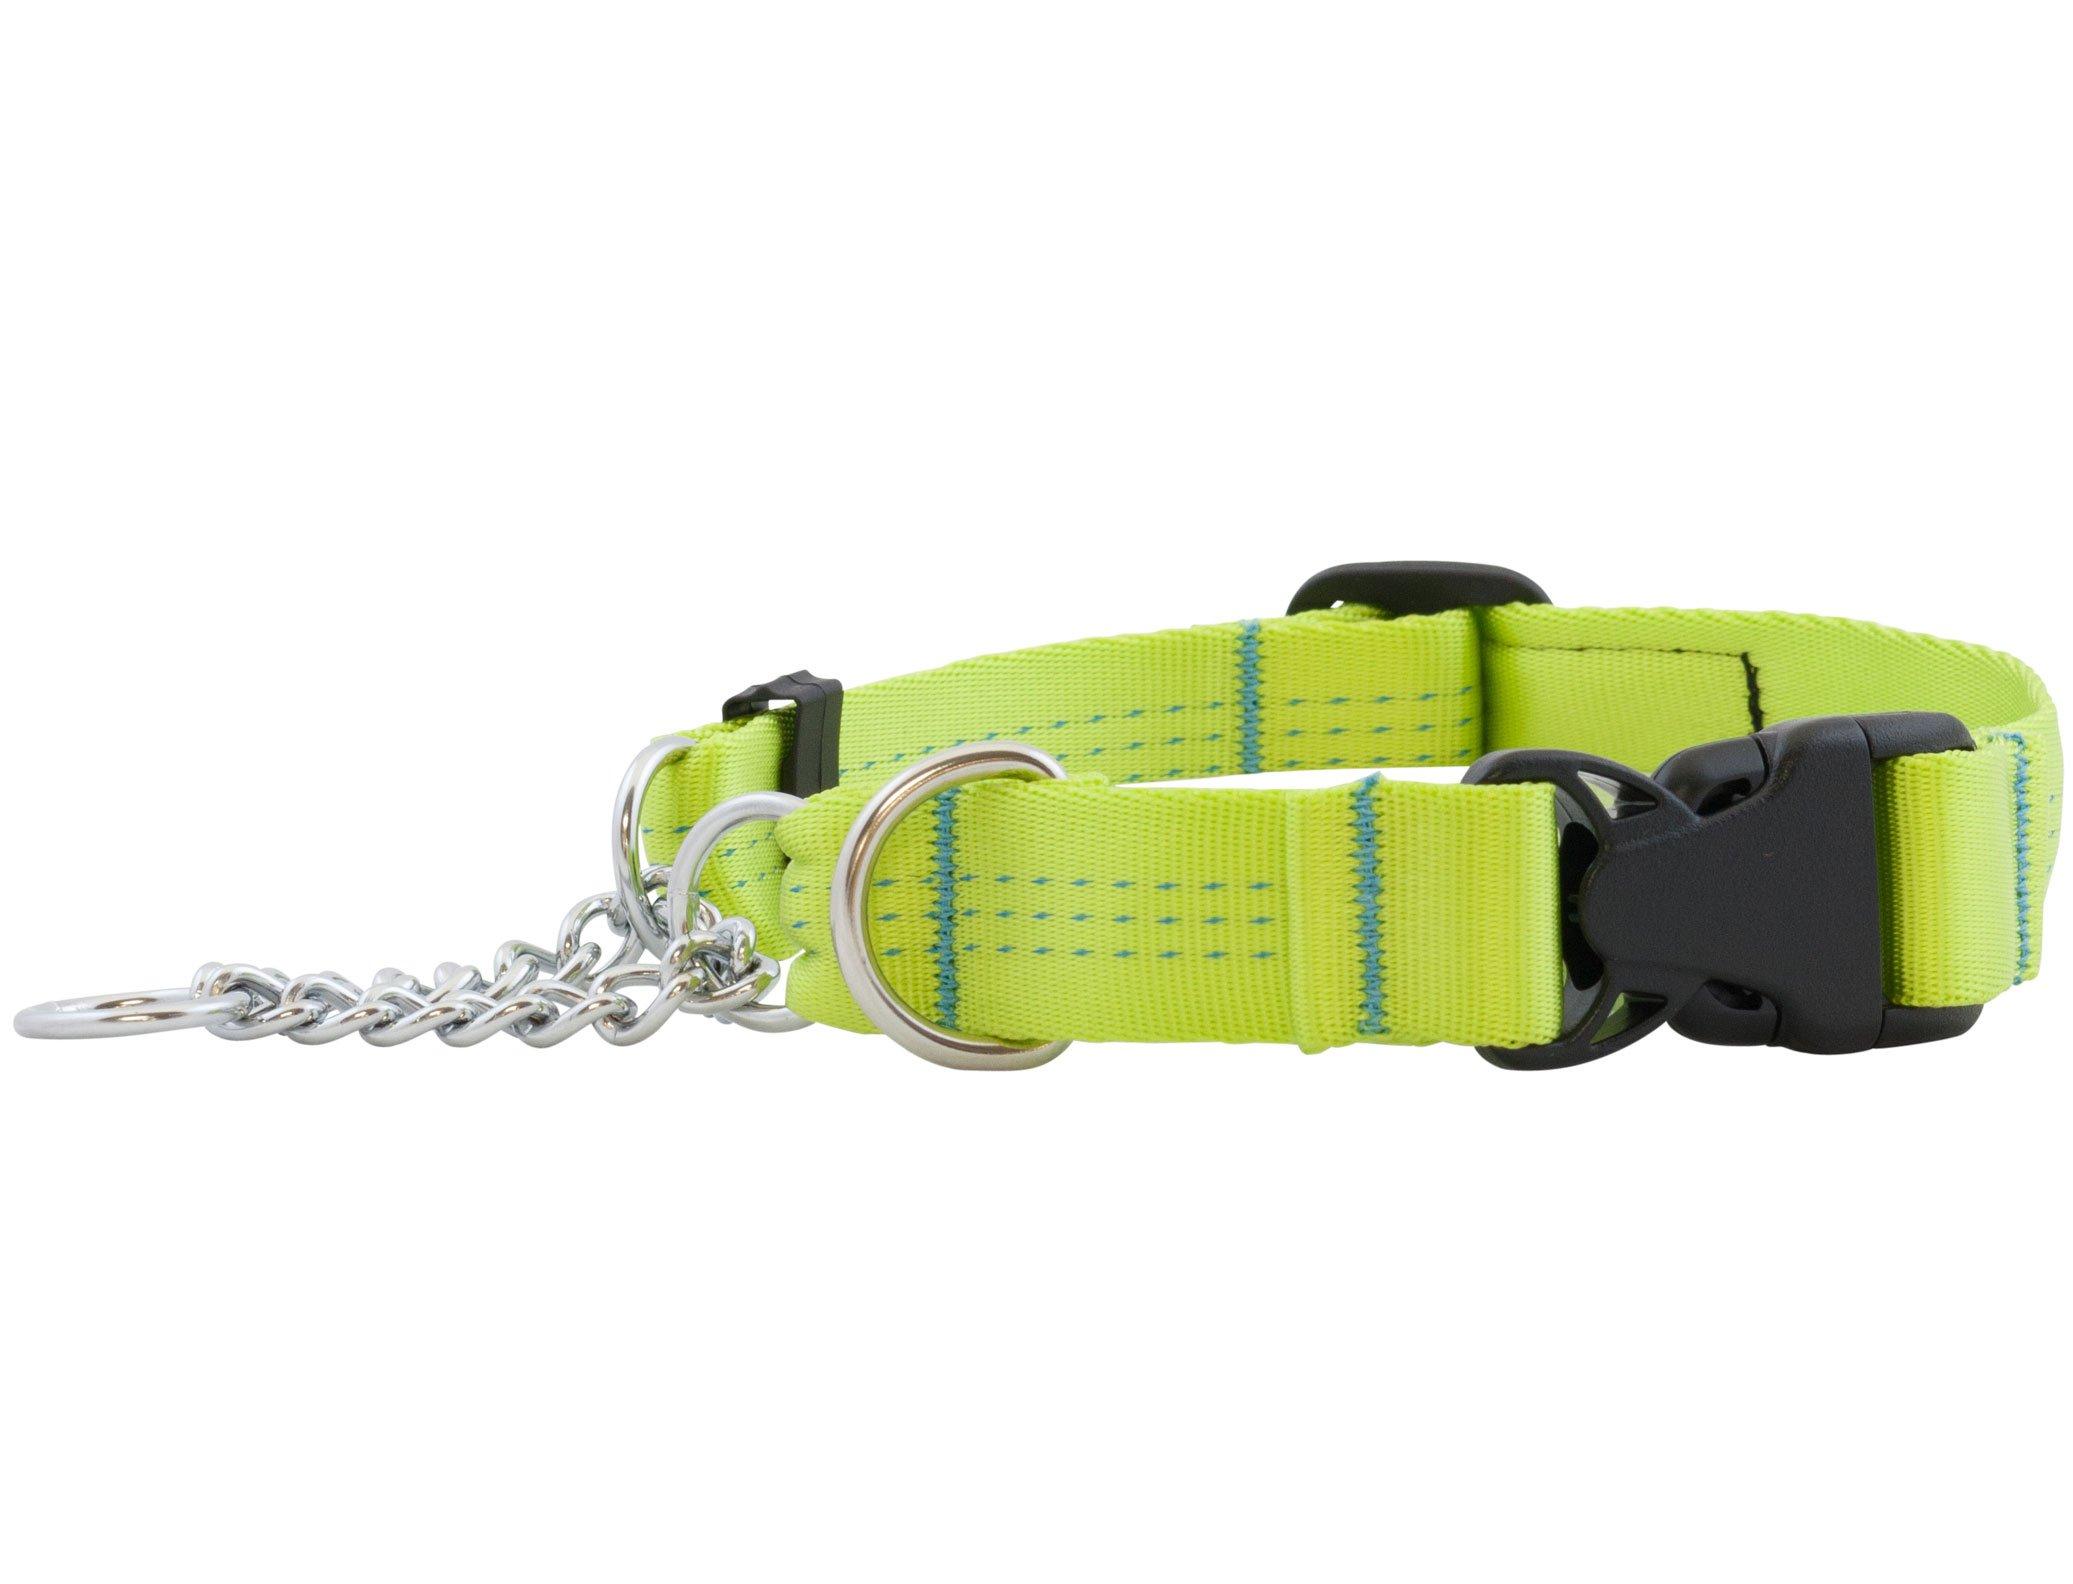 Canine Equipment Technika 1-Inch Quick Release Martingale Dog Collar, Medium, Lime